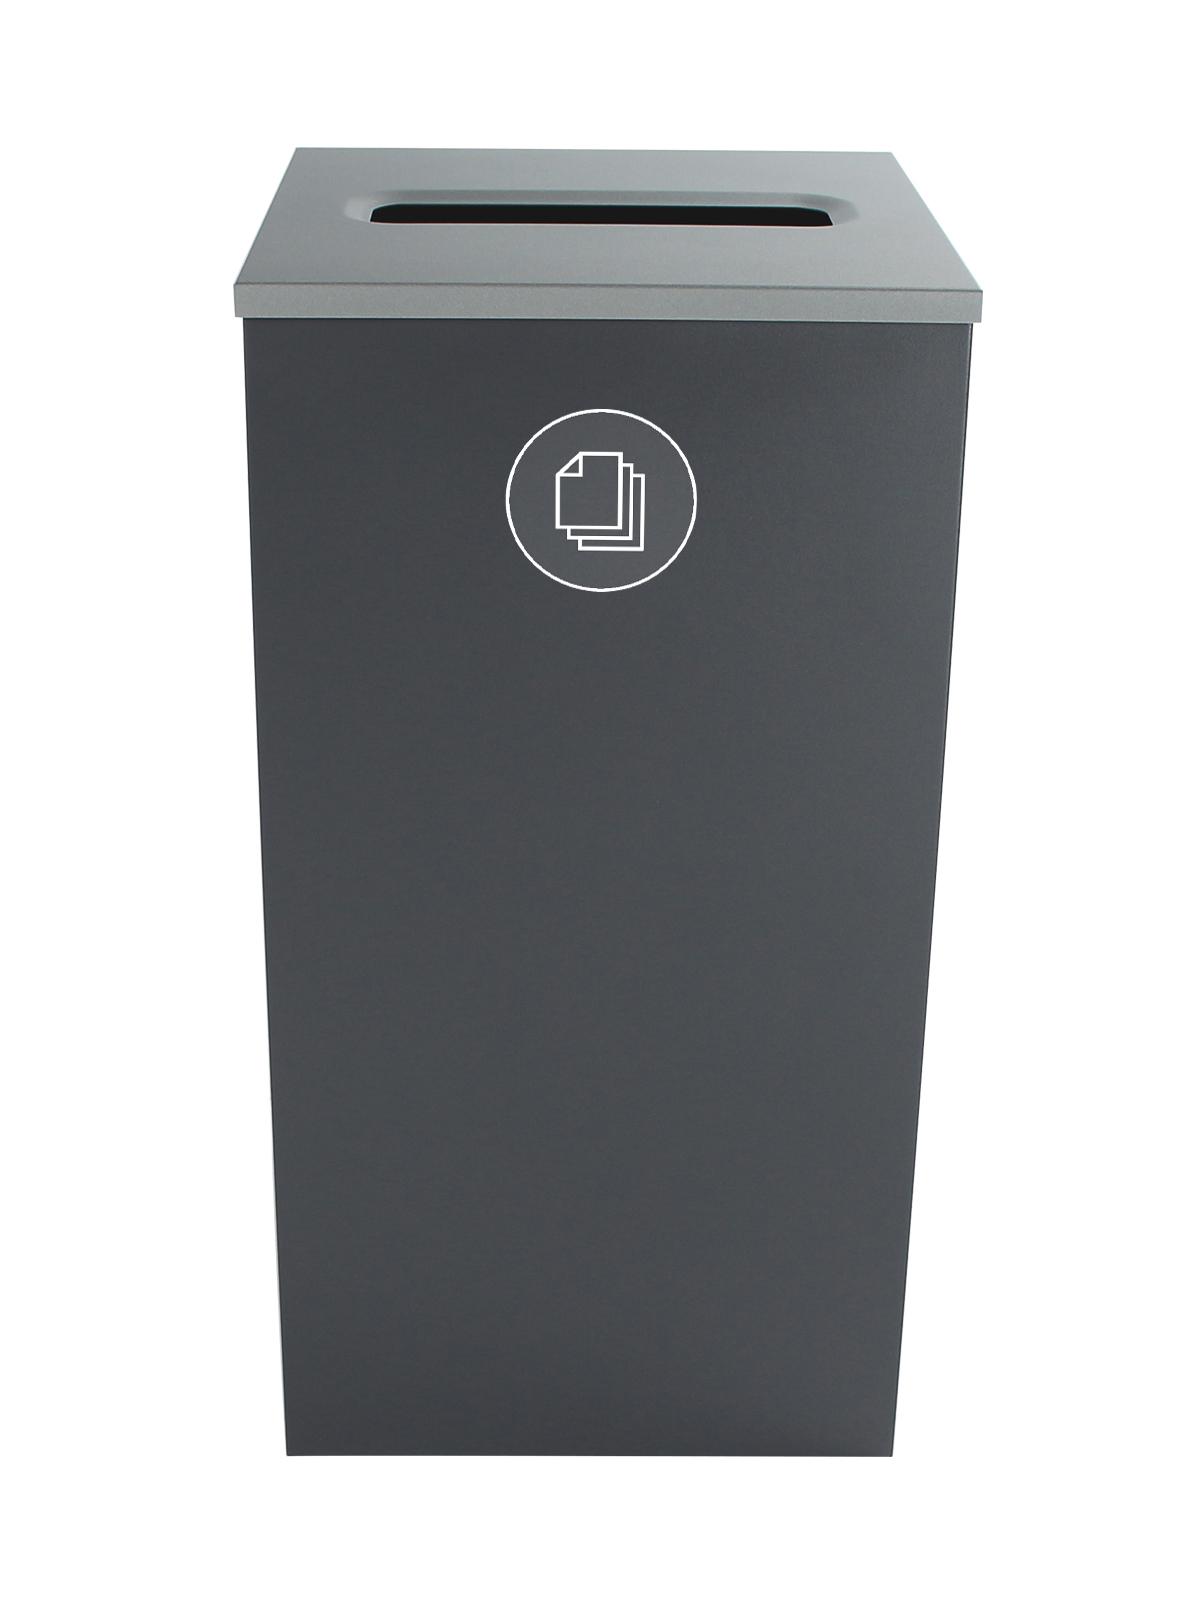 SPECTRUM - Single - Cube - Paper - Slot - Grey